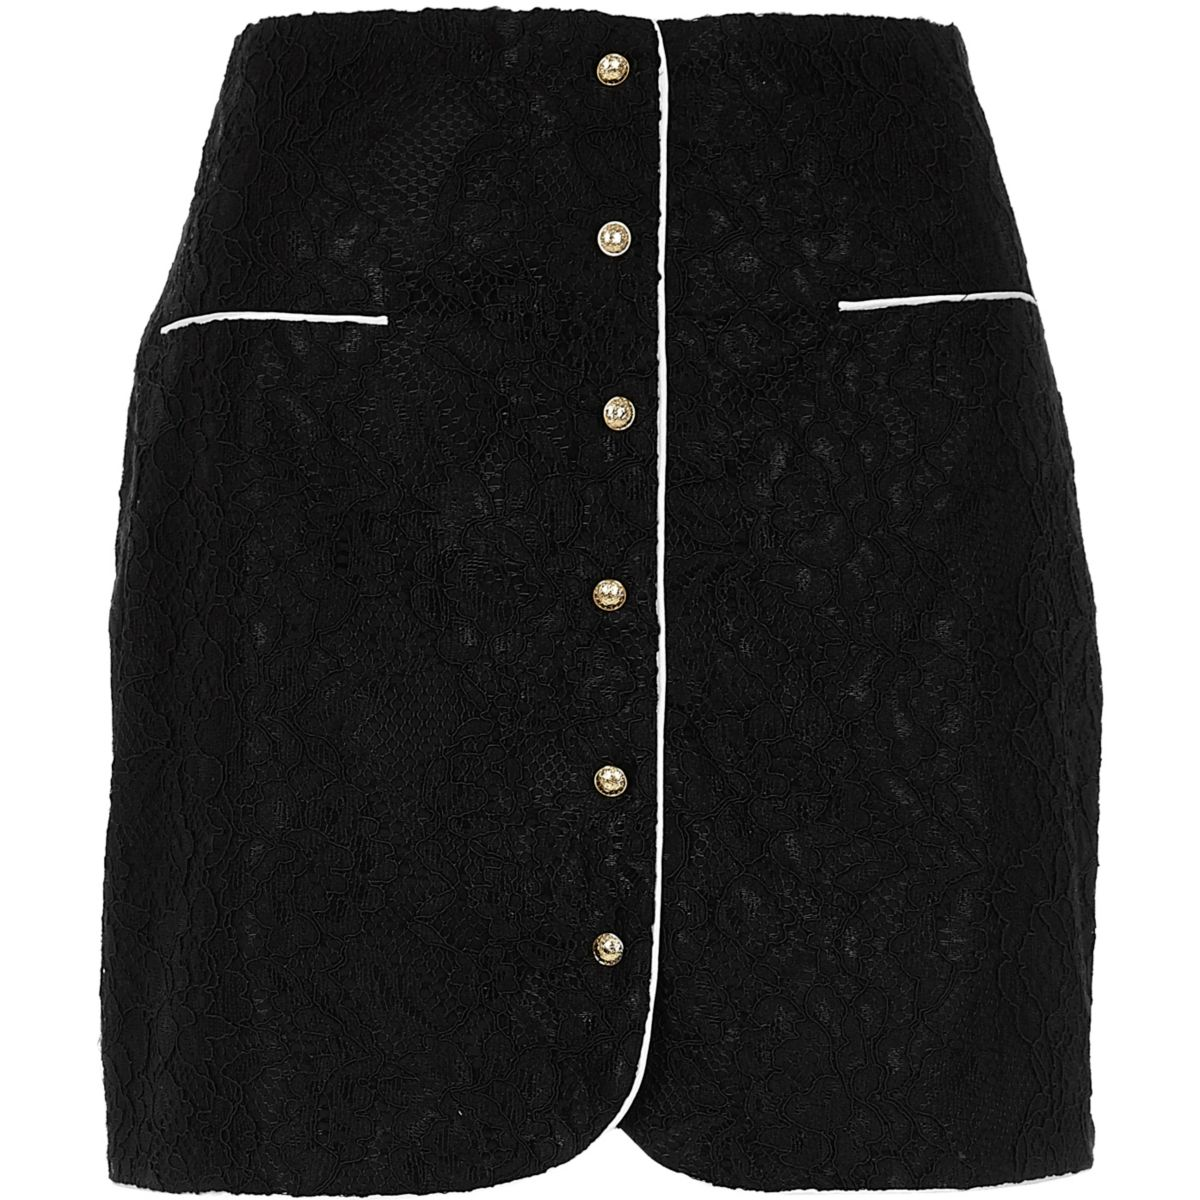 Black button front lace mini skirt